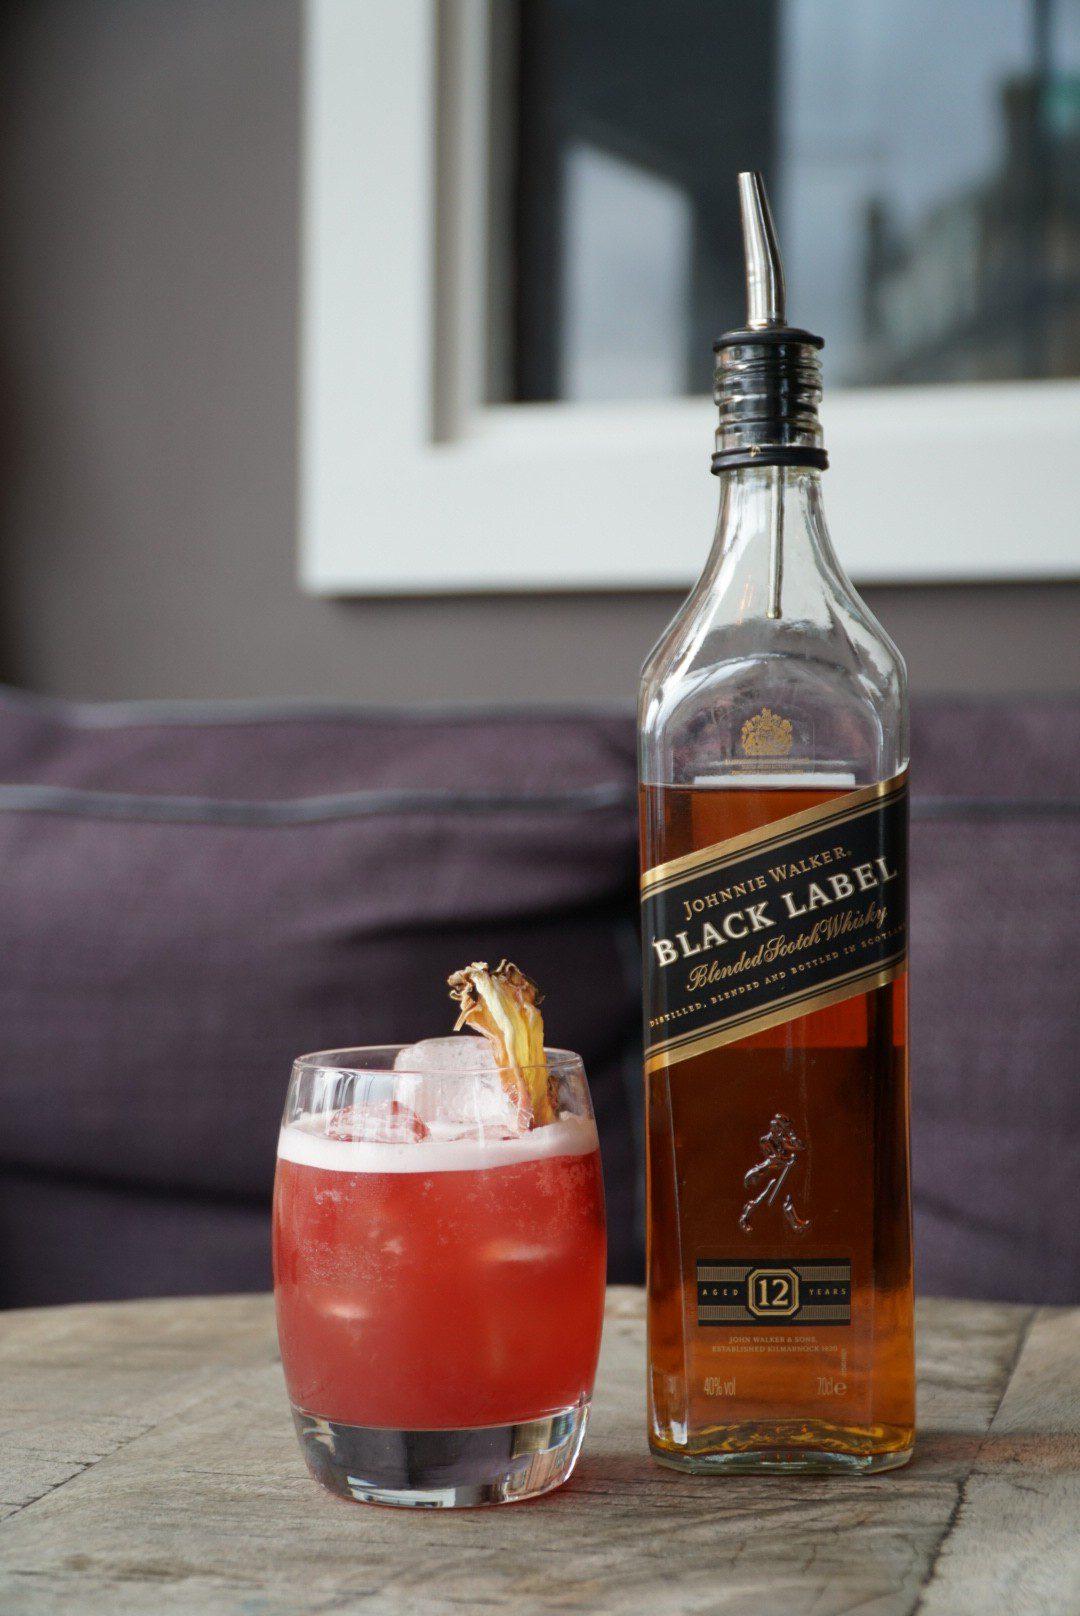 The Huxley whisky